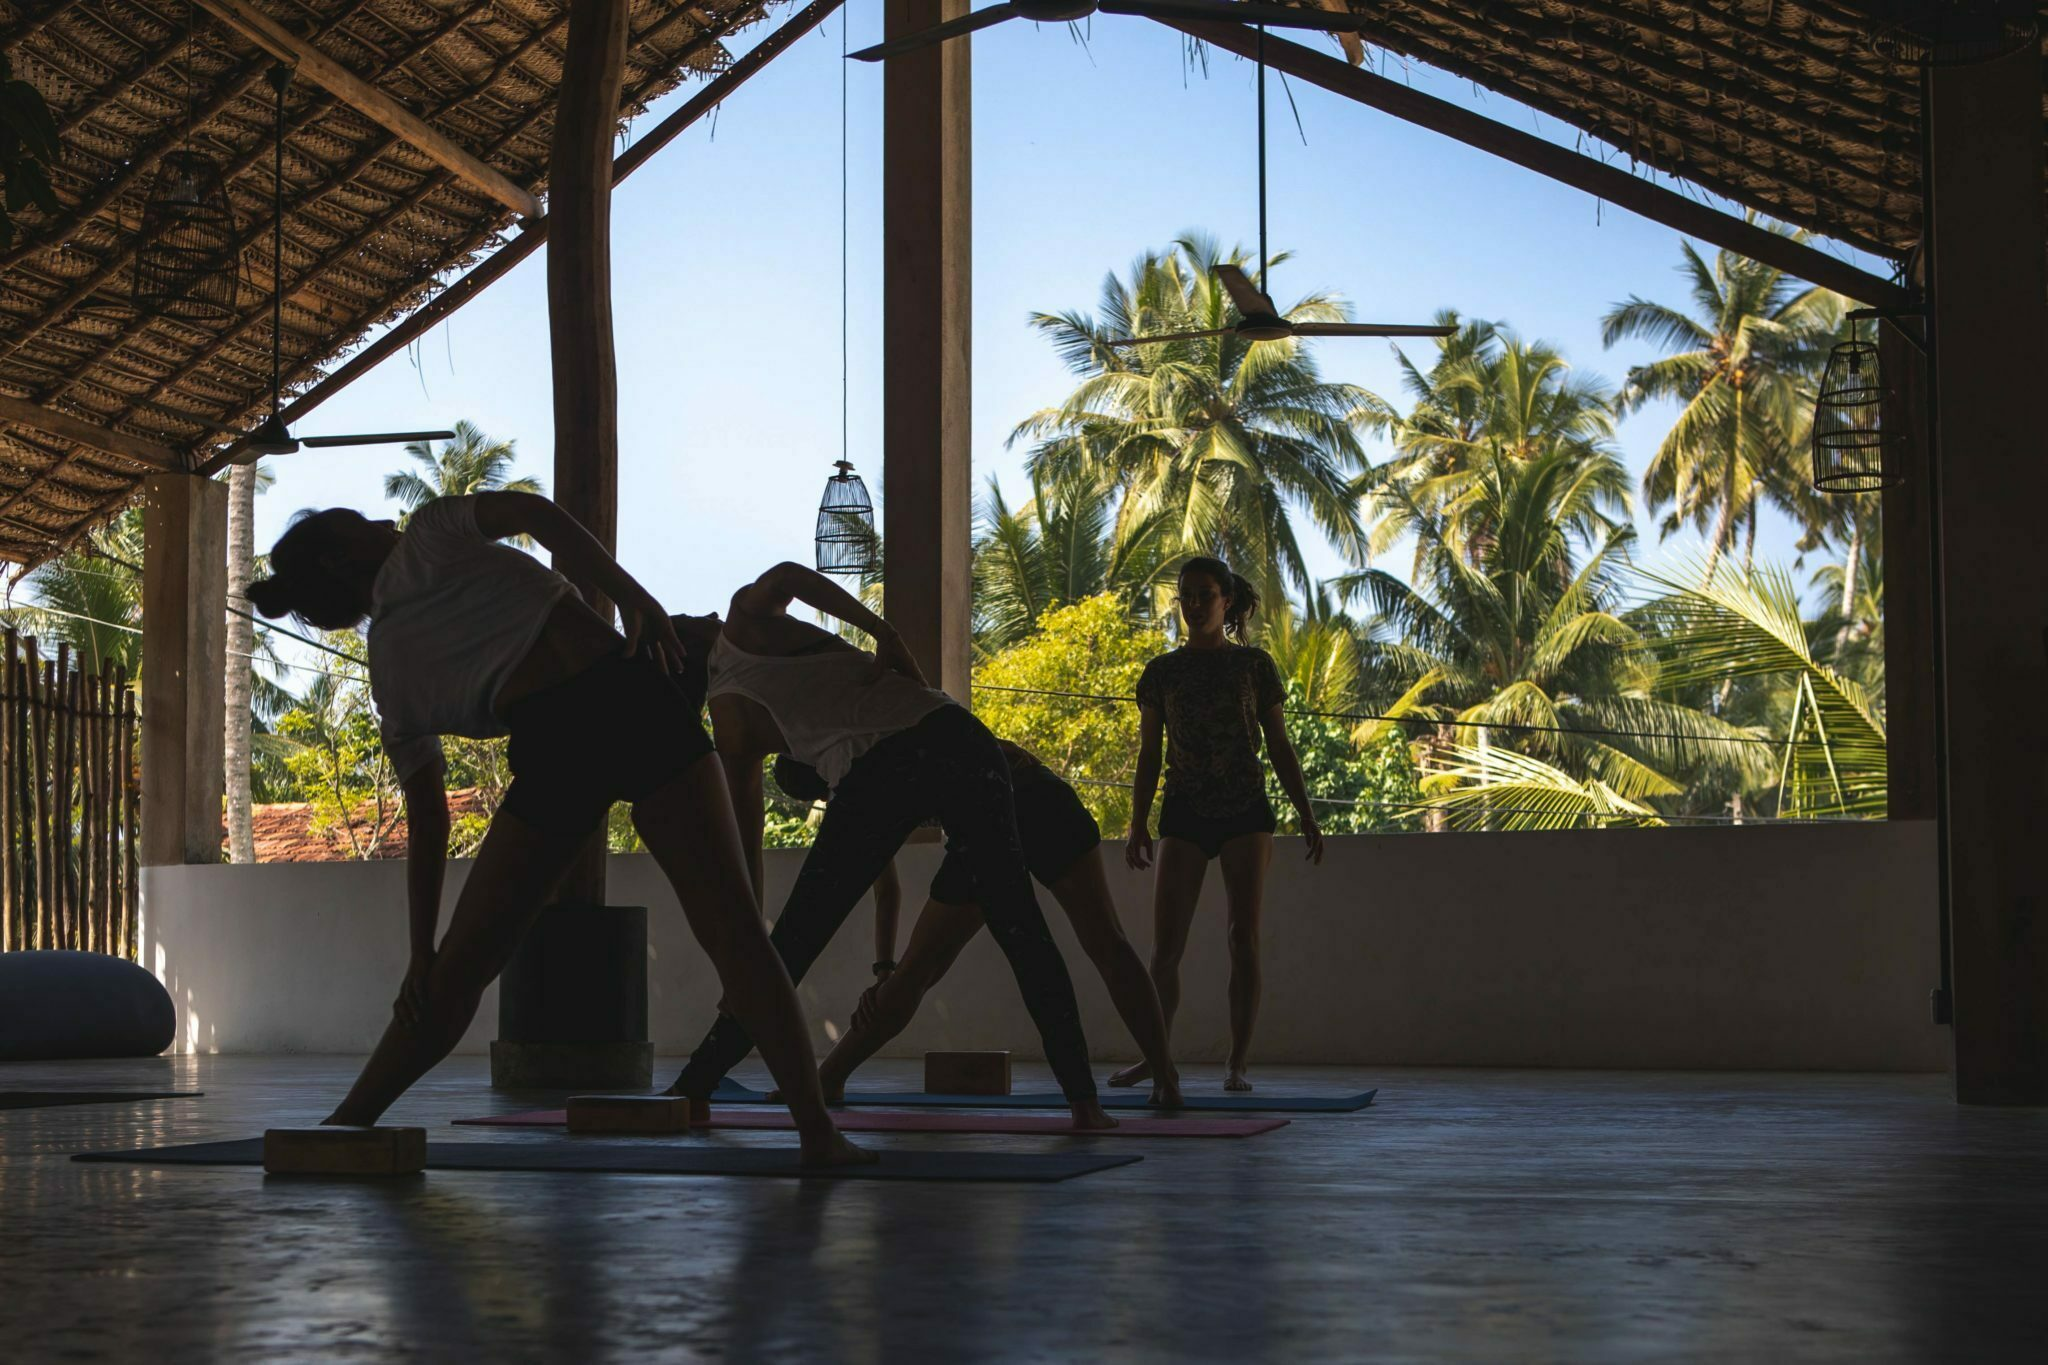 200hr-yoga-teacher-training-sri lanka-stefancamilleriyoga30_SMALL